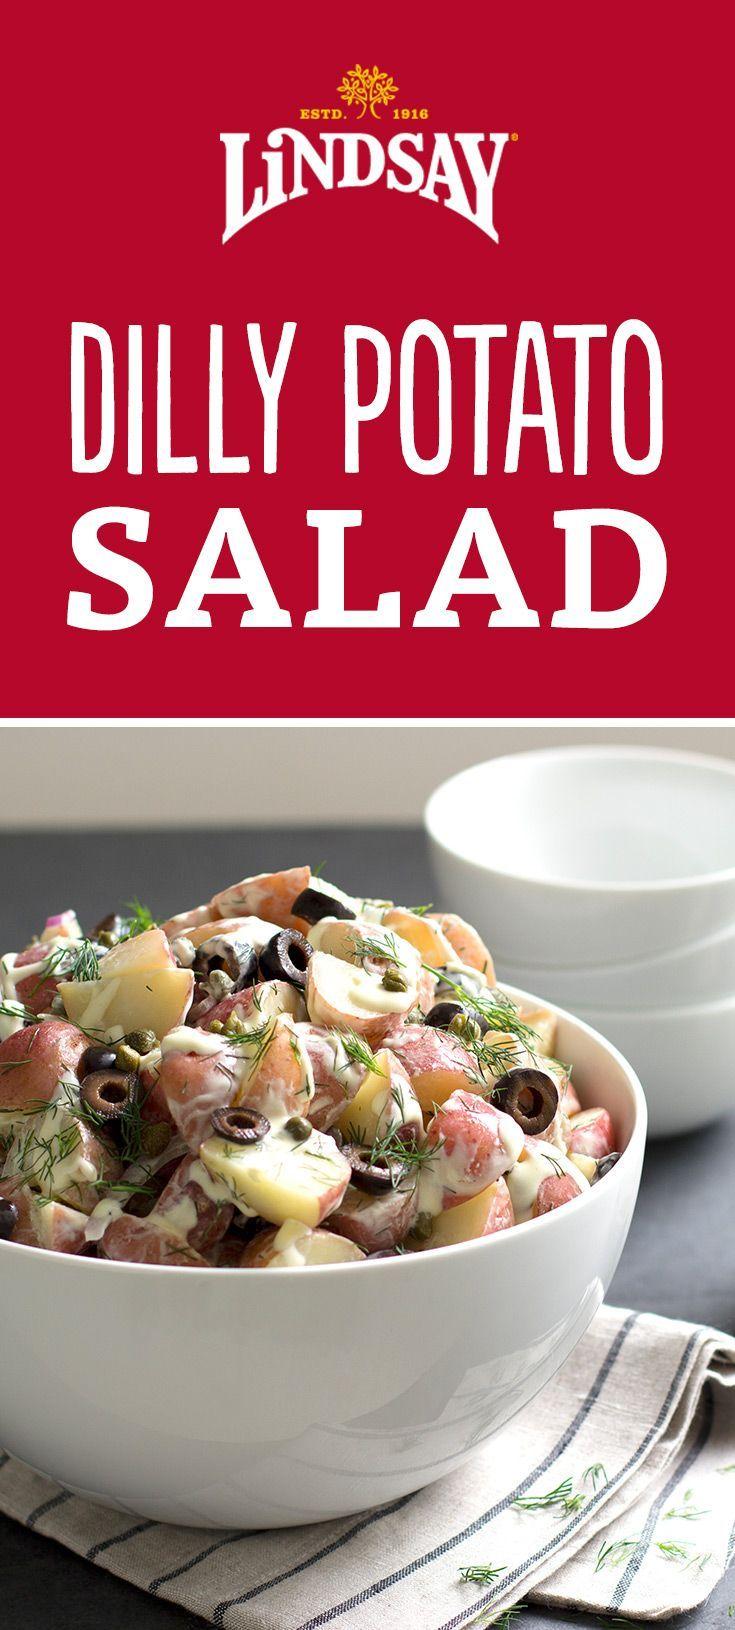 Dilly Potato Salad With Creamy Champagne Dressing Lindsay Recipe Potato Salad Recipes Vegan Dishes